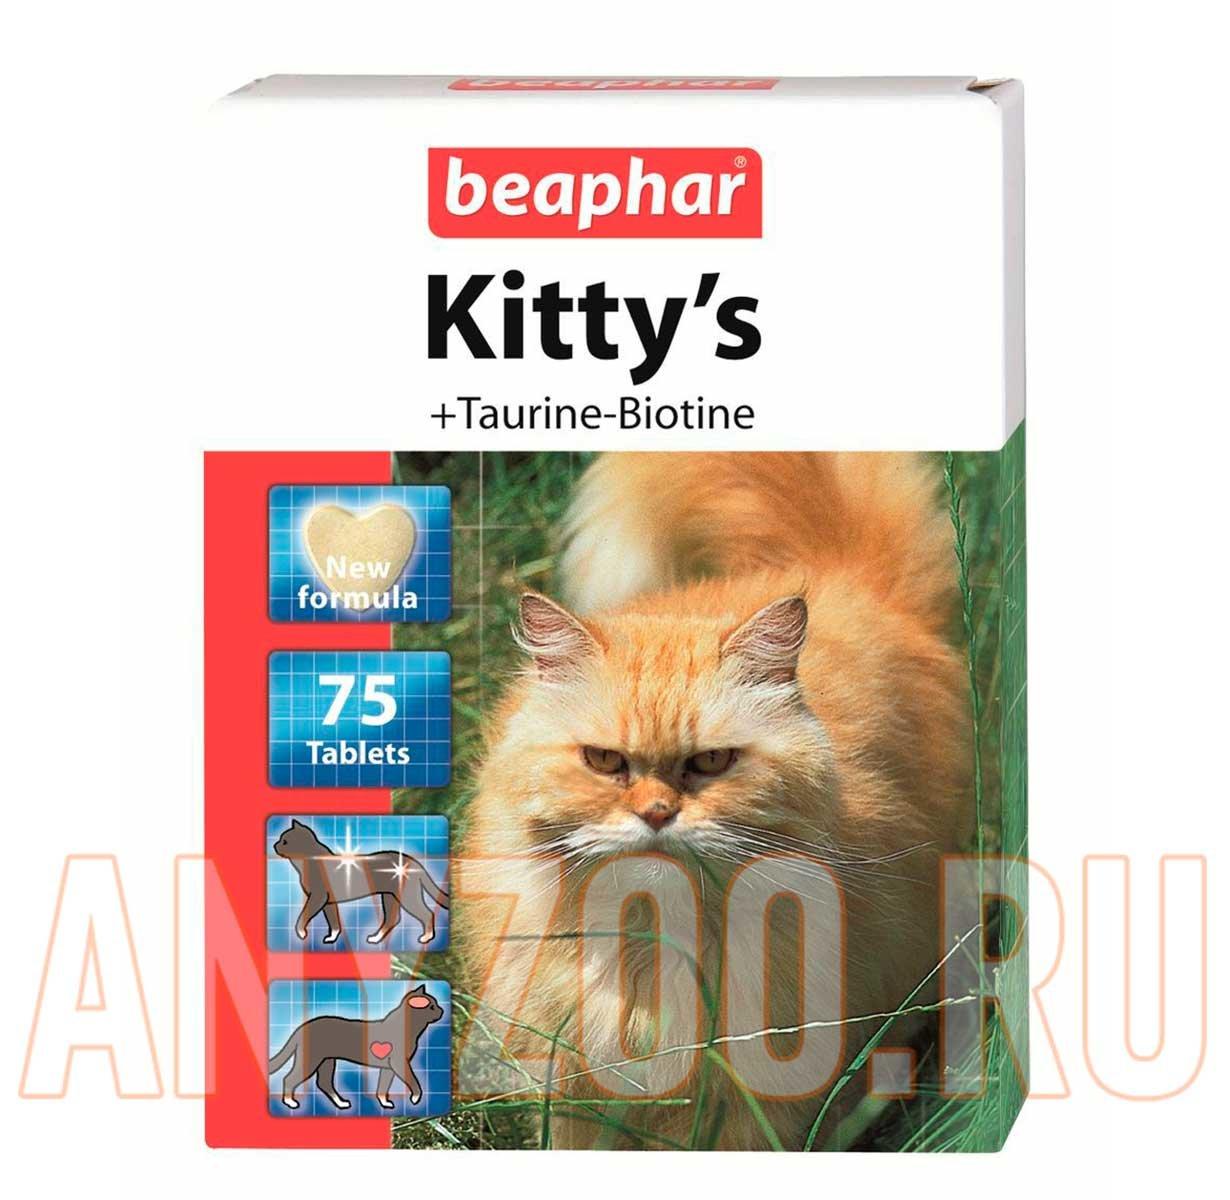 Beaphar Kittys Taurin&Biotin Витаминизированное лакомство с таурином и биотином для кошек, 75 таб ( Беафар витамины для кошек )